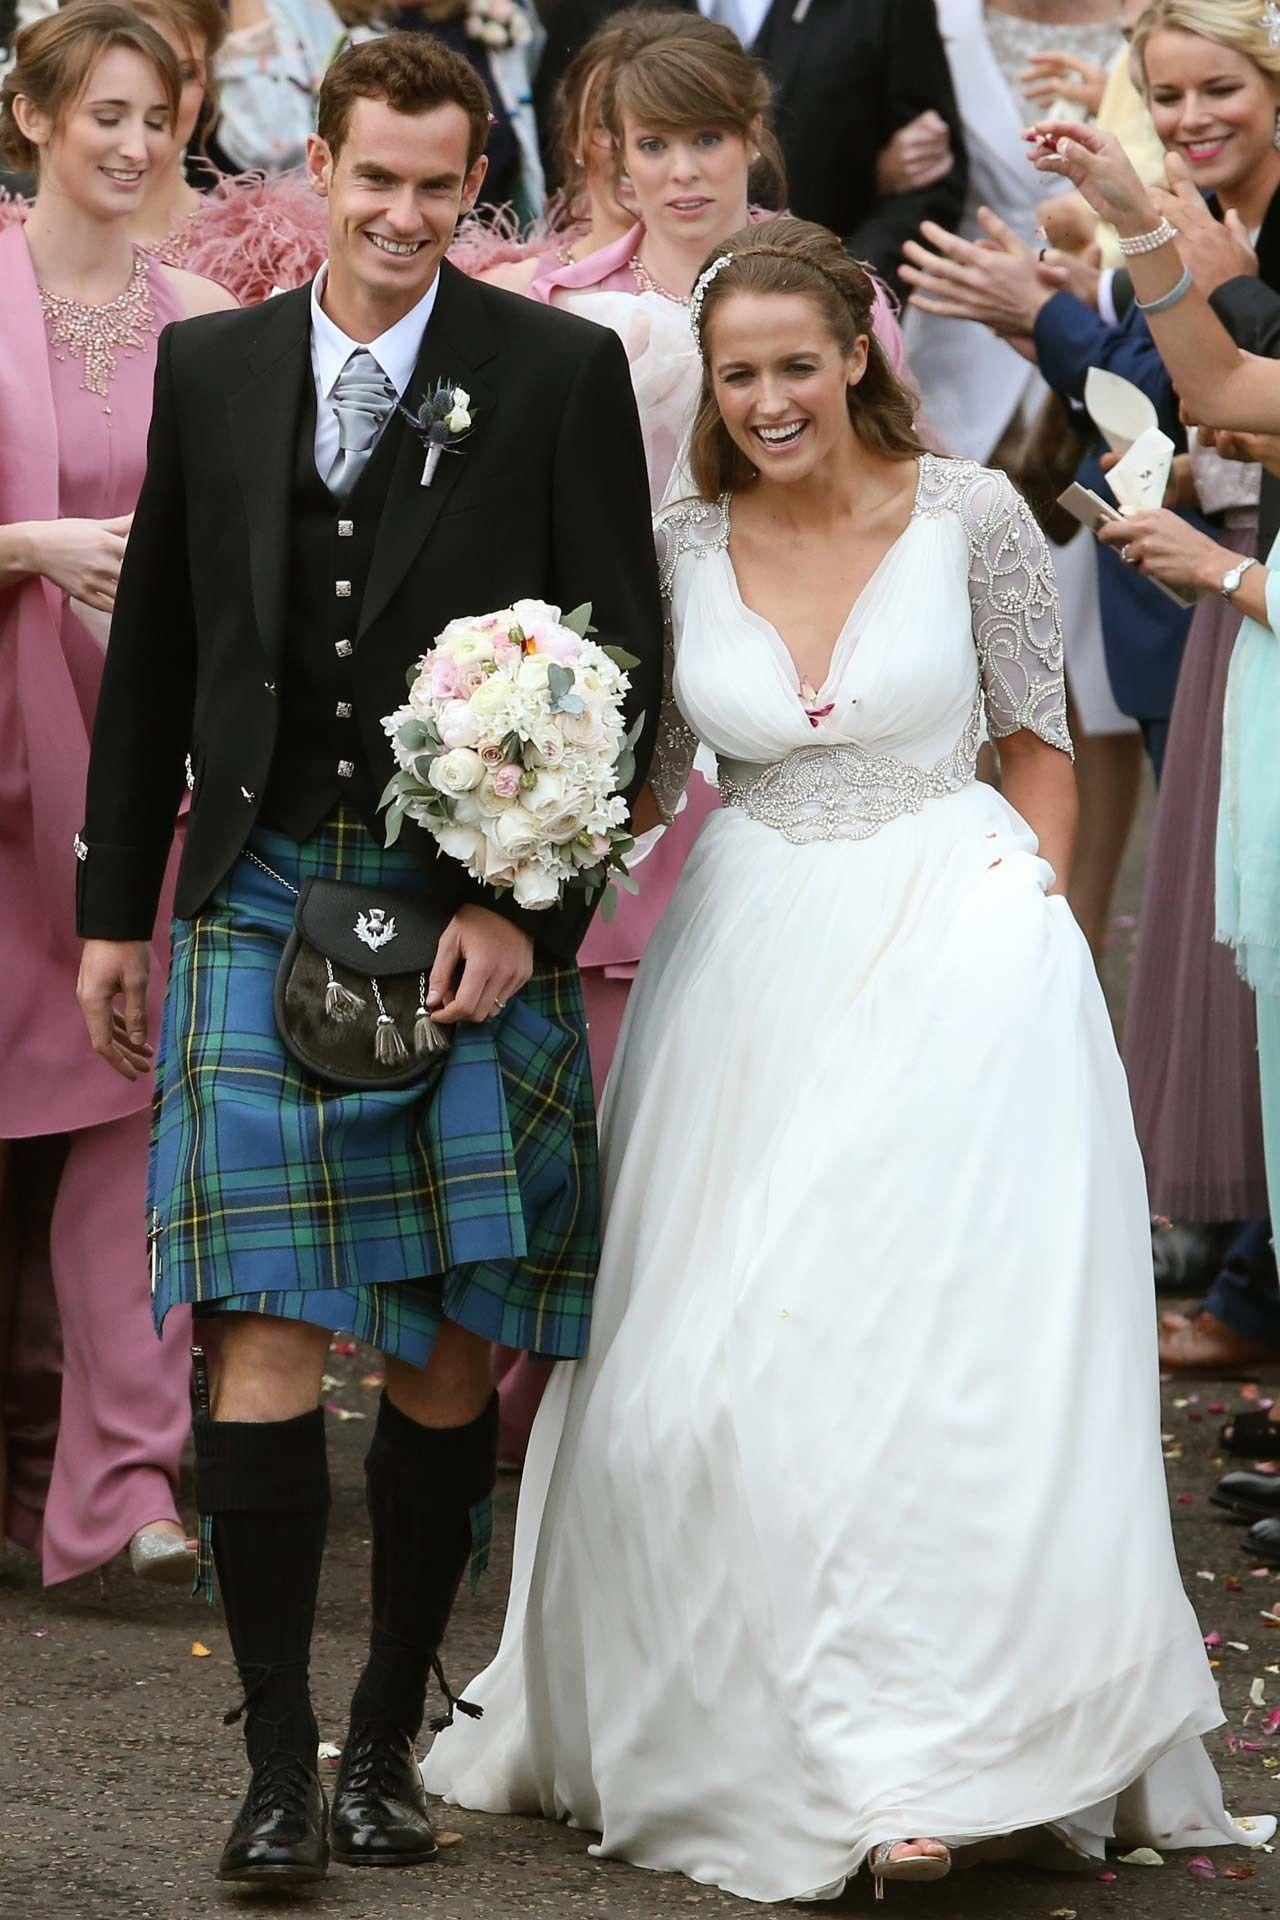 sears wedding bands Andy Murray Kim Sears Wedding Latest BridesMagazine co uk